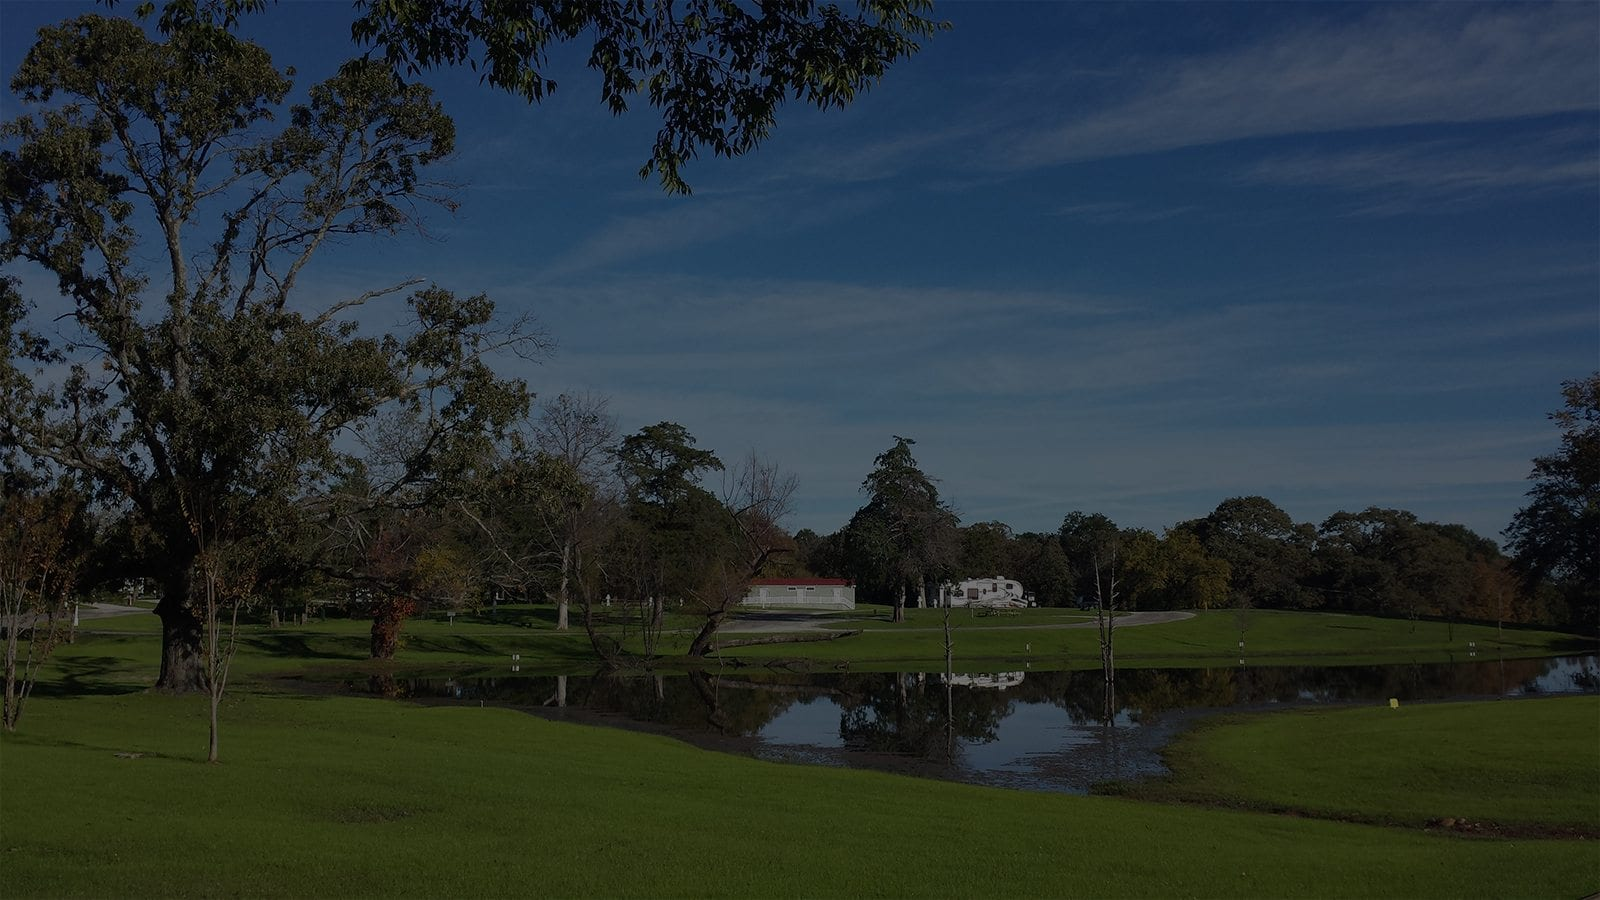 Texas Resort-Canton Texas Lodging | Mill Creek Ranch Resort